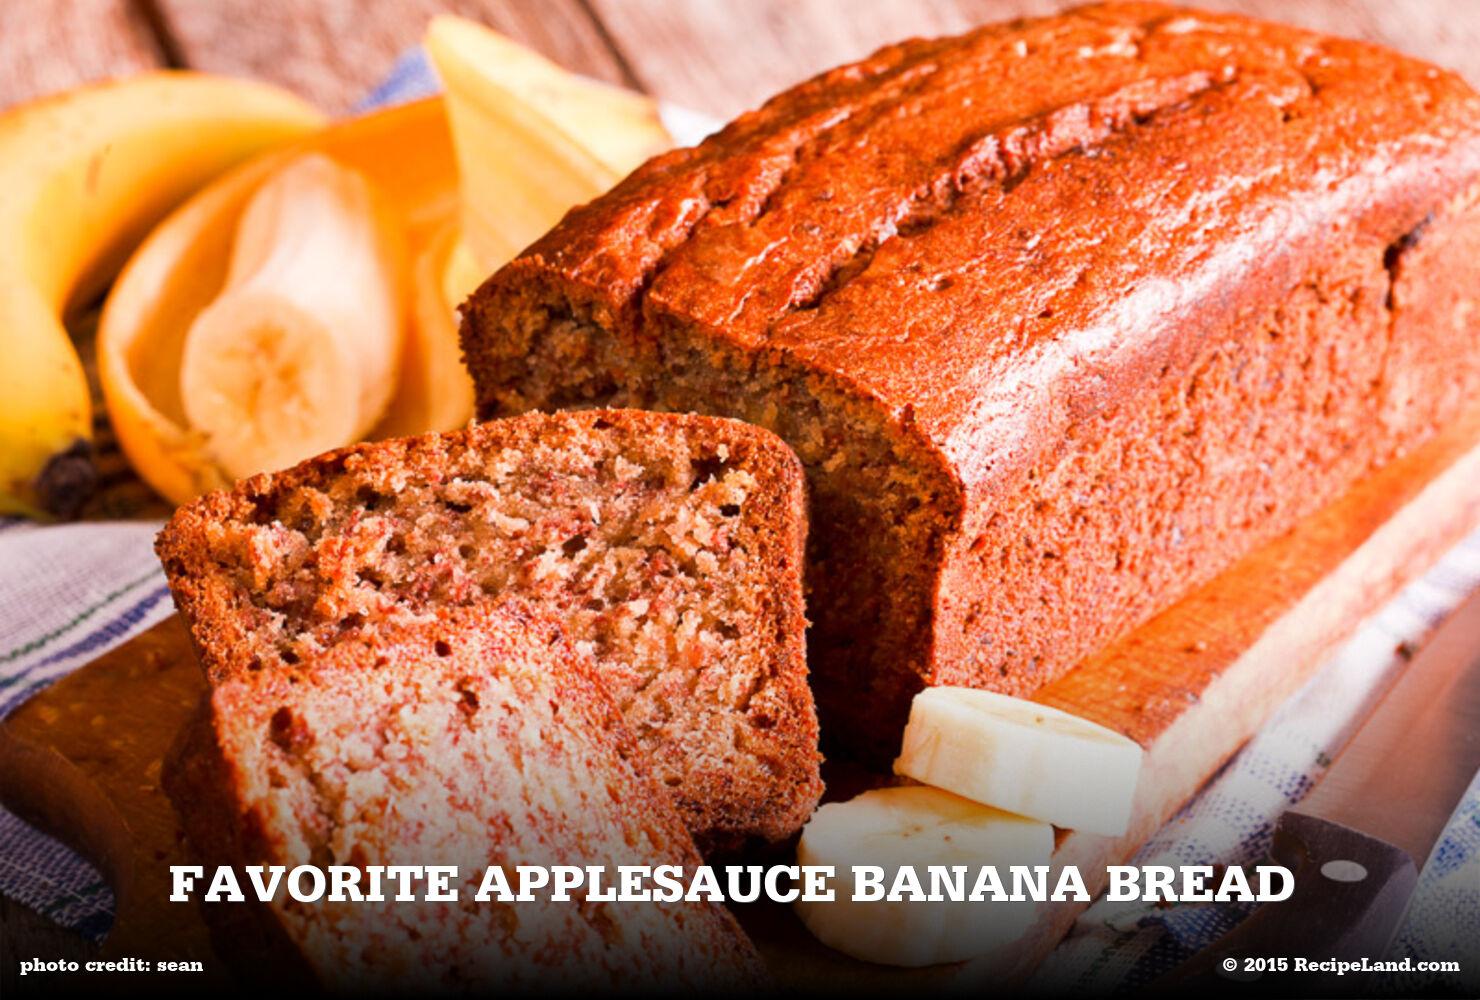 Favorite Applesauce Banana Bread